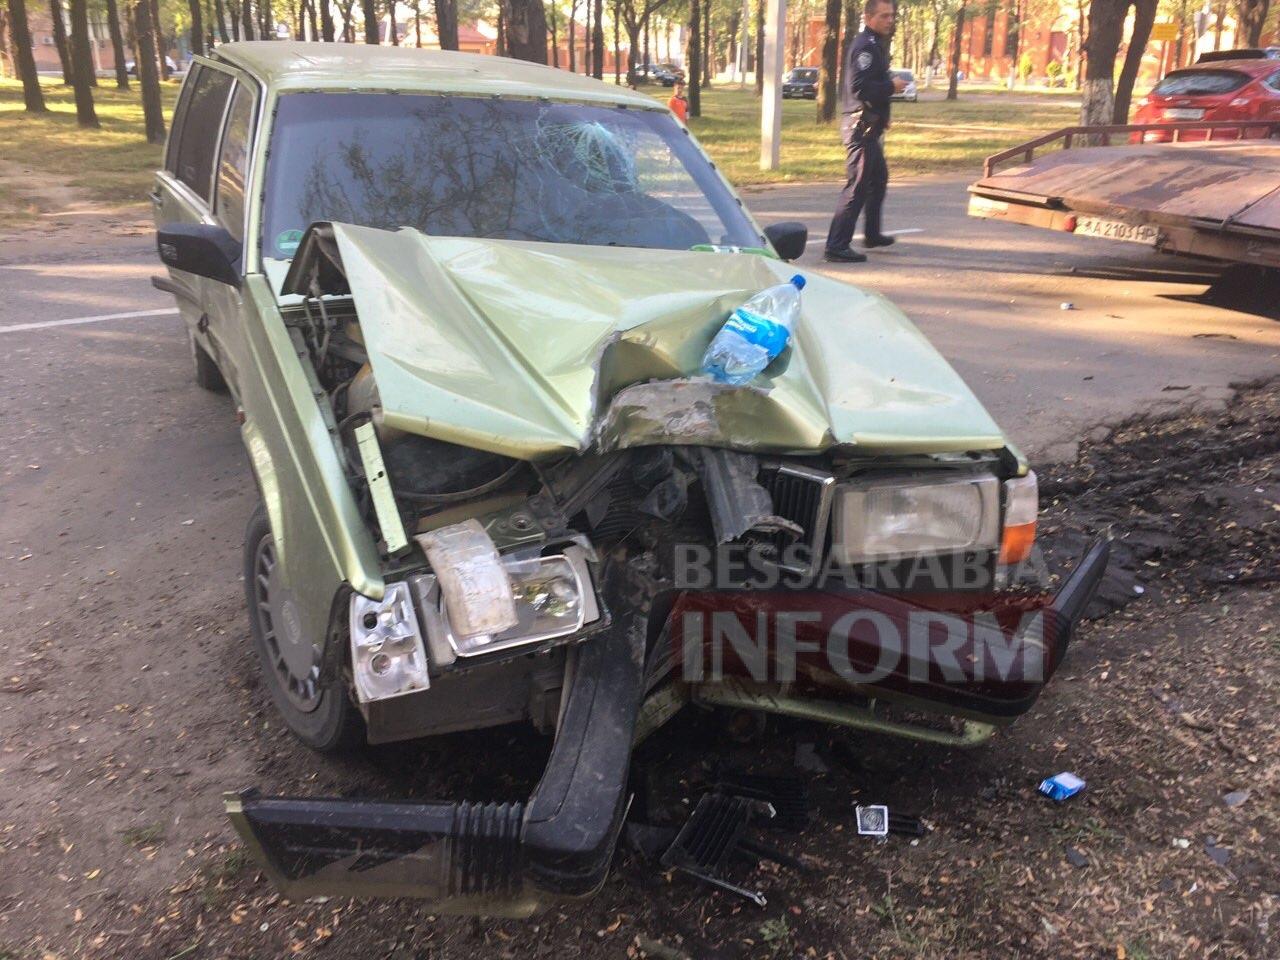 57ed192bedf0c_54745 Измаил: на проспекте Суворова произошло смертельное ДТП (фото)